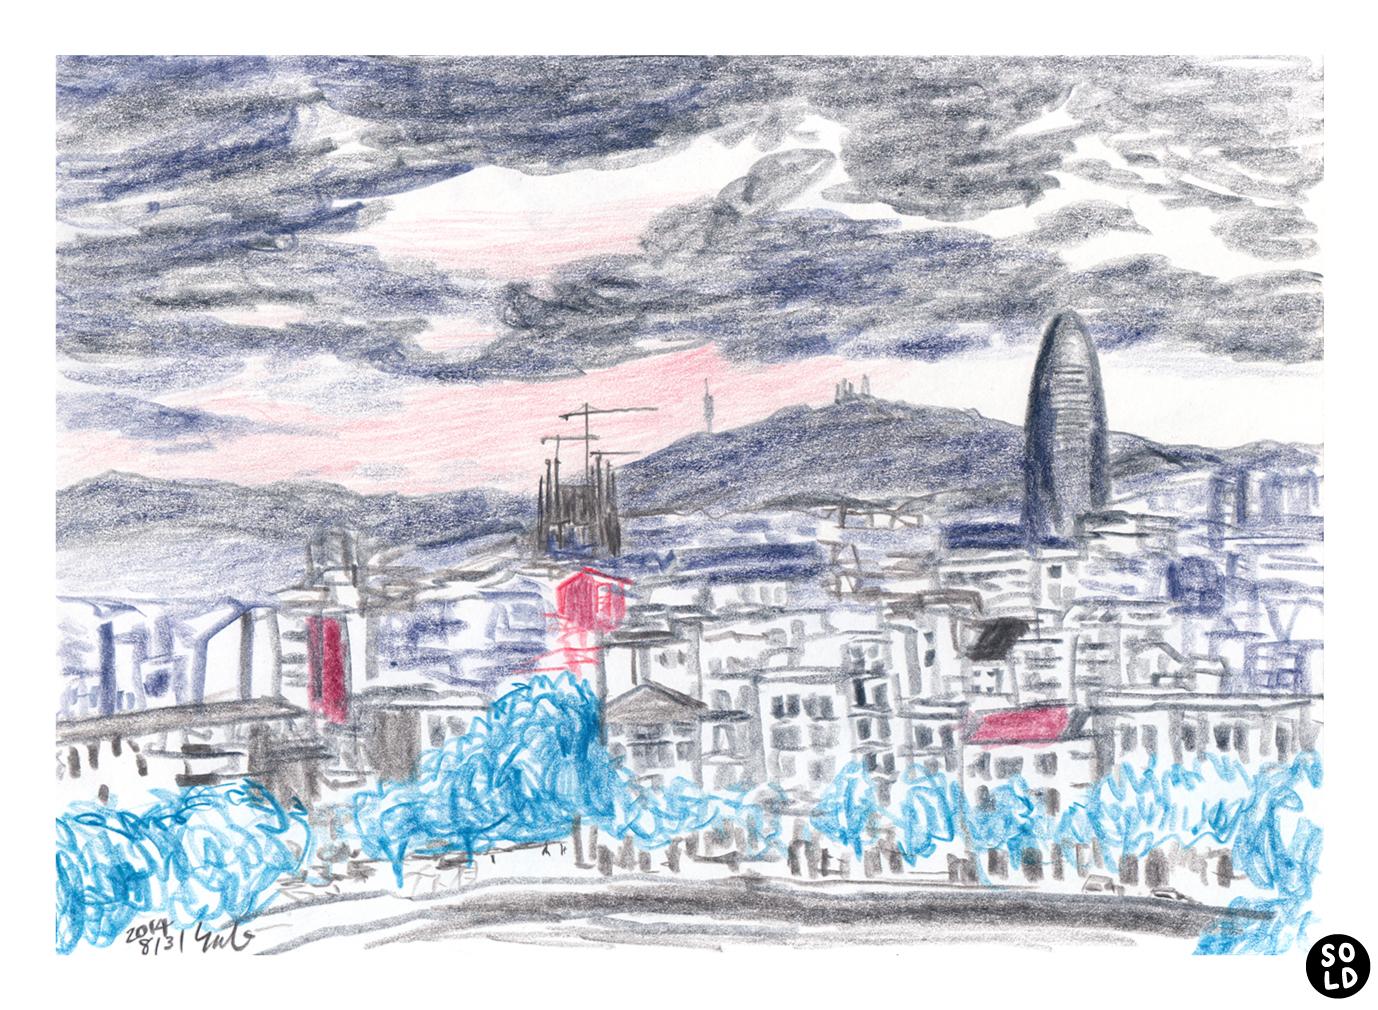 Illustration of Sagrada Família and Torre Agbar seen from ILUNION Barcelona hotel in Poblenou neighborhood in Barcelona